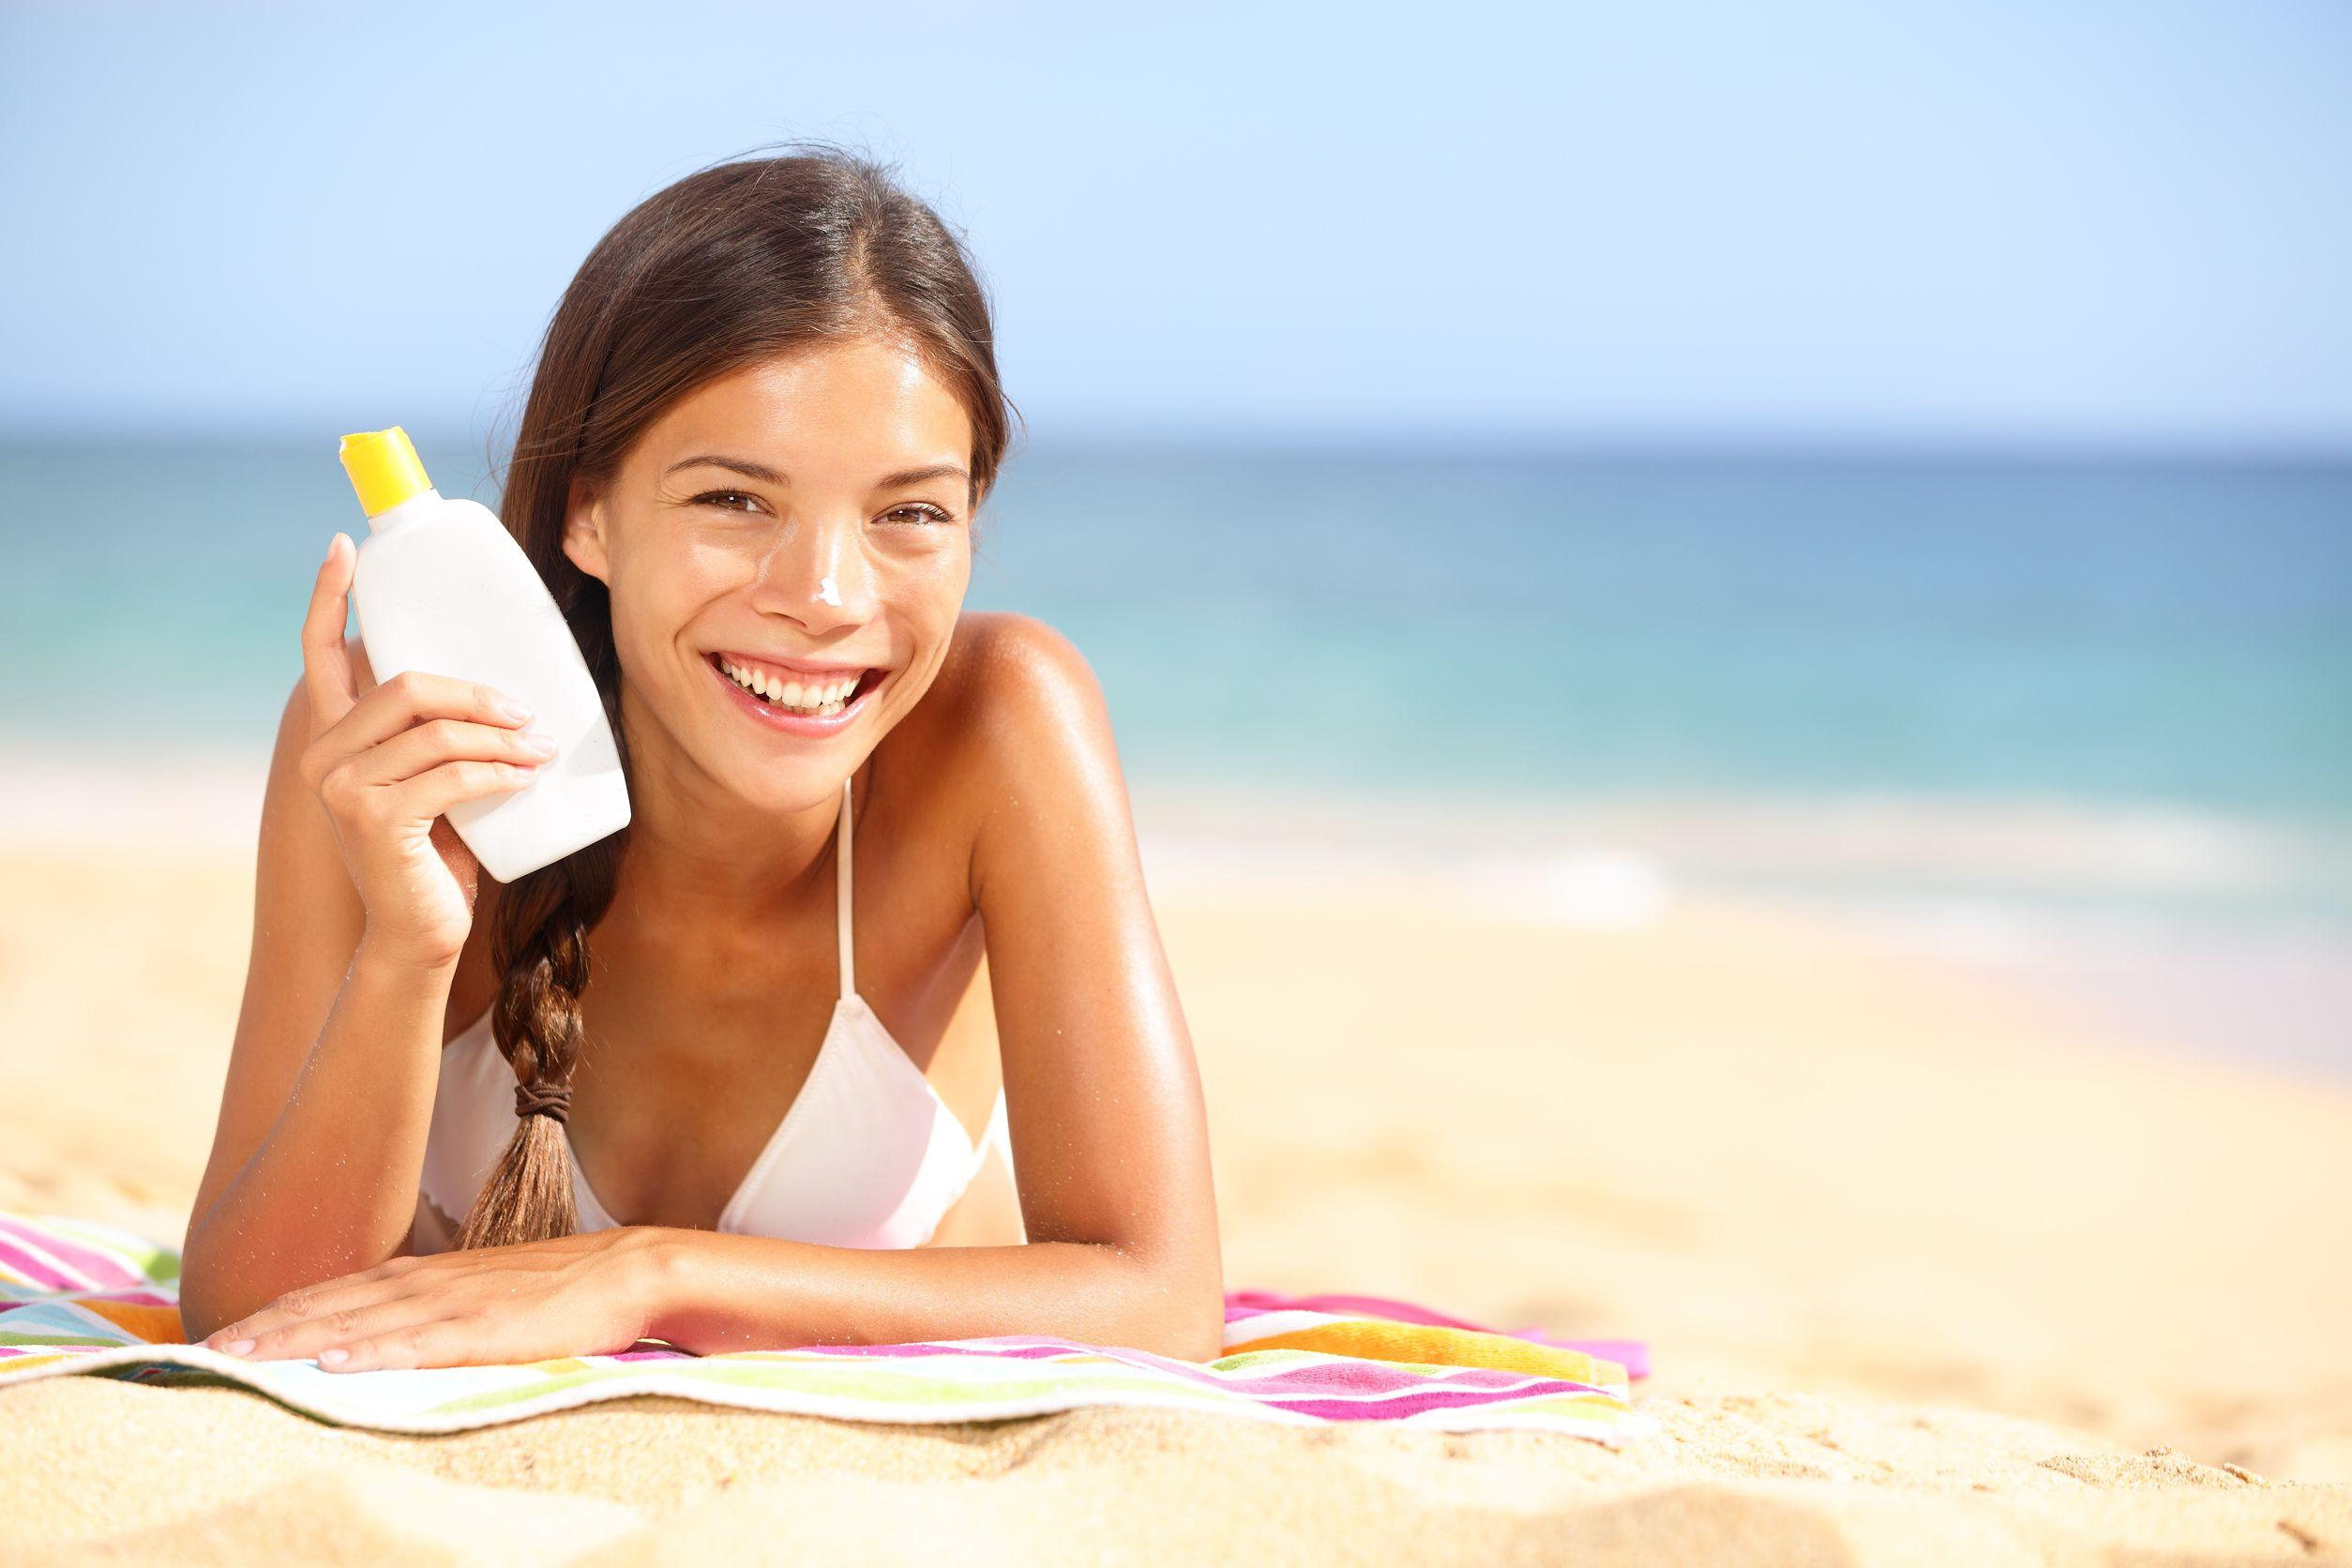 Mulher na praia segurando proteger